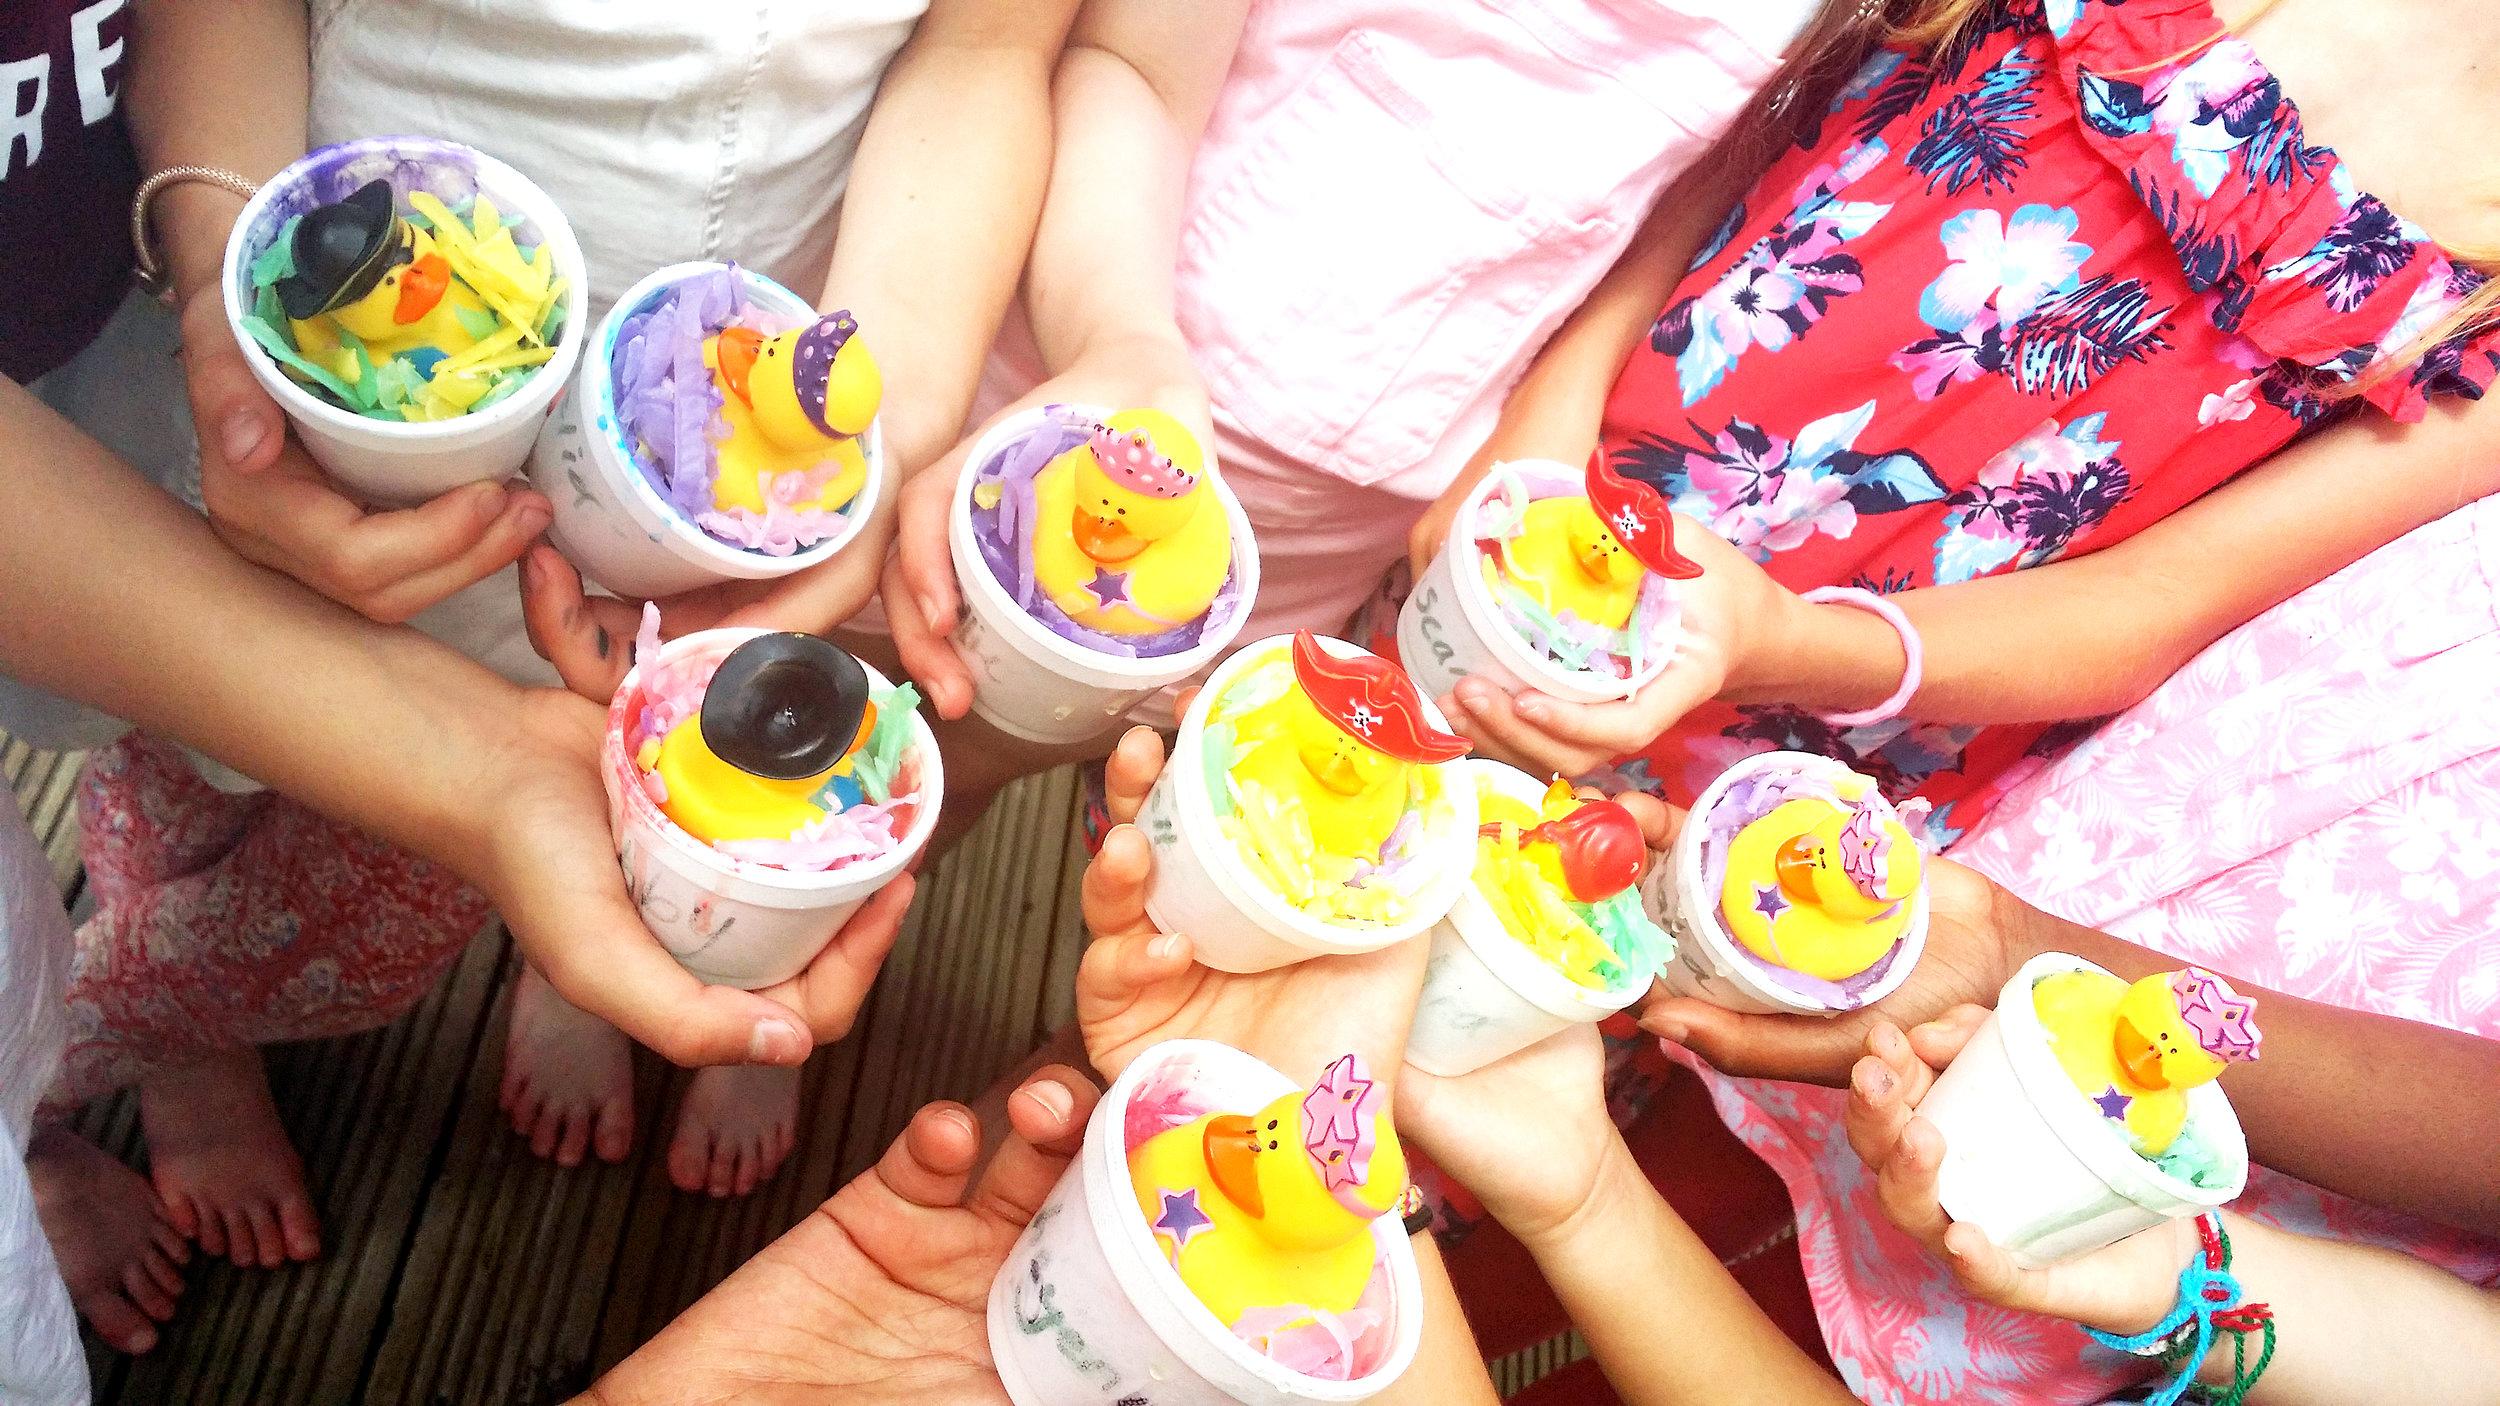 Copy of girls showcasing their soap making skills